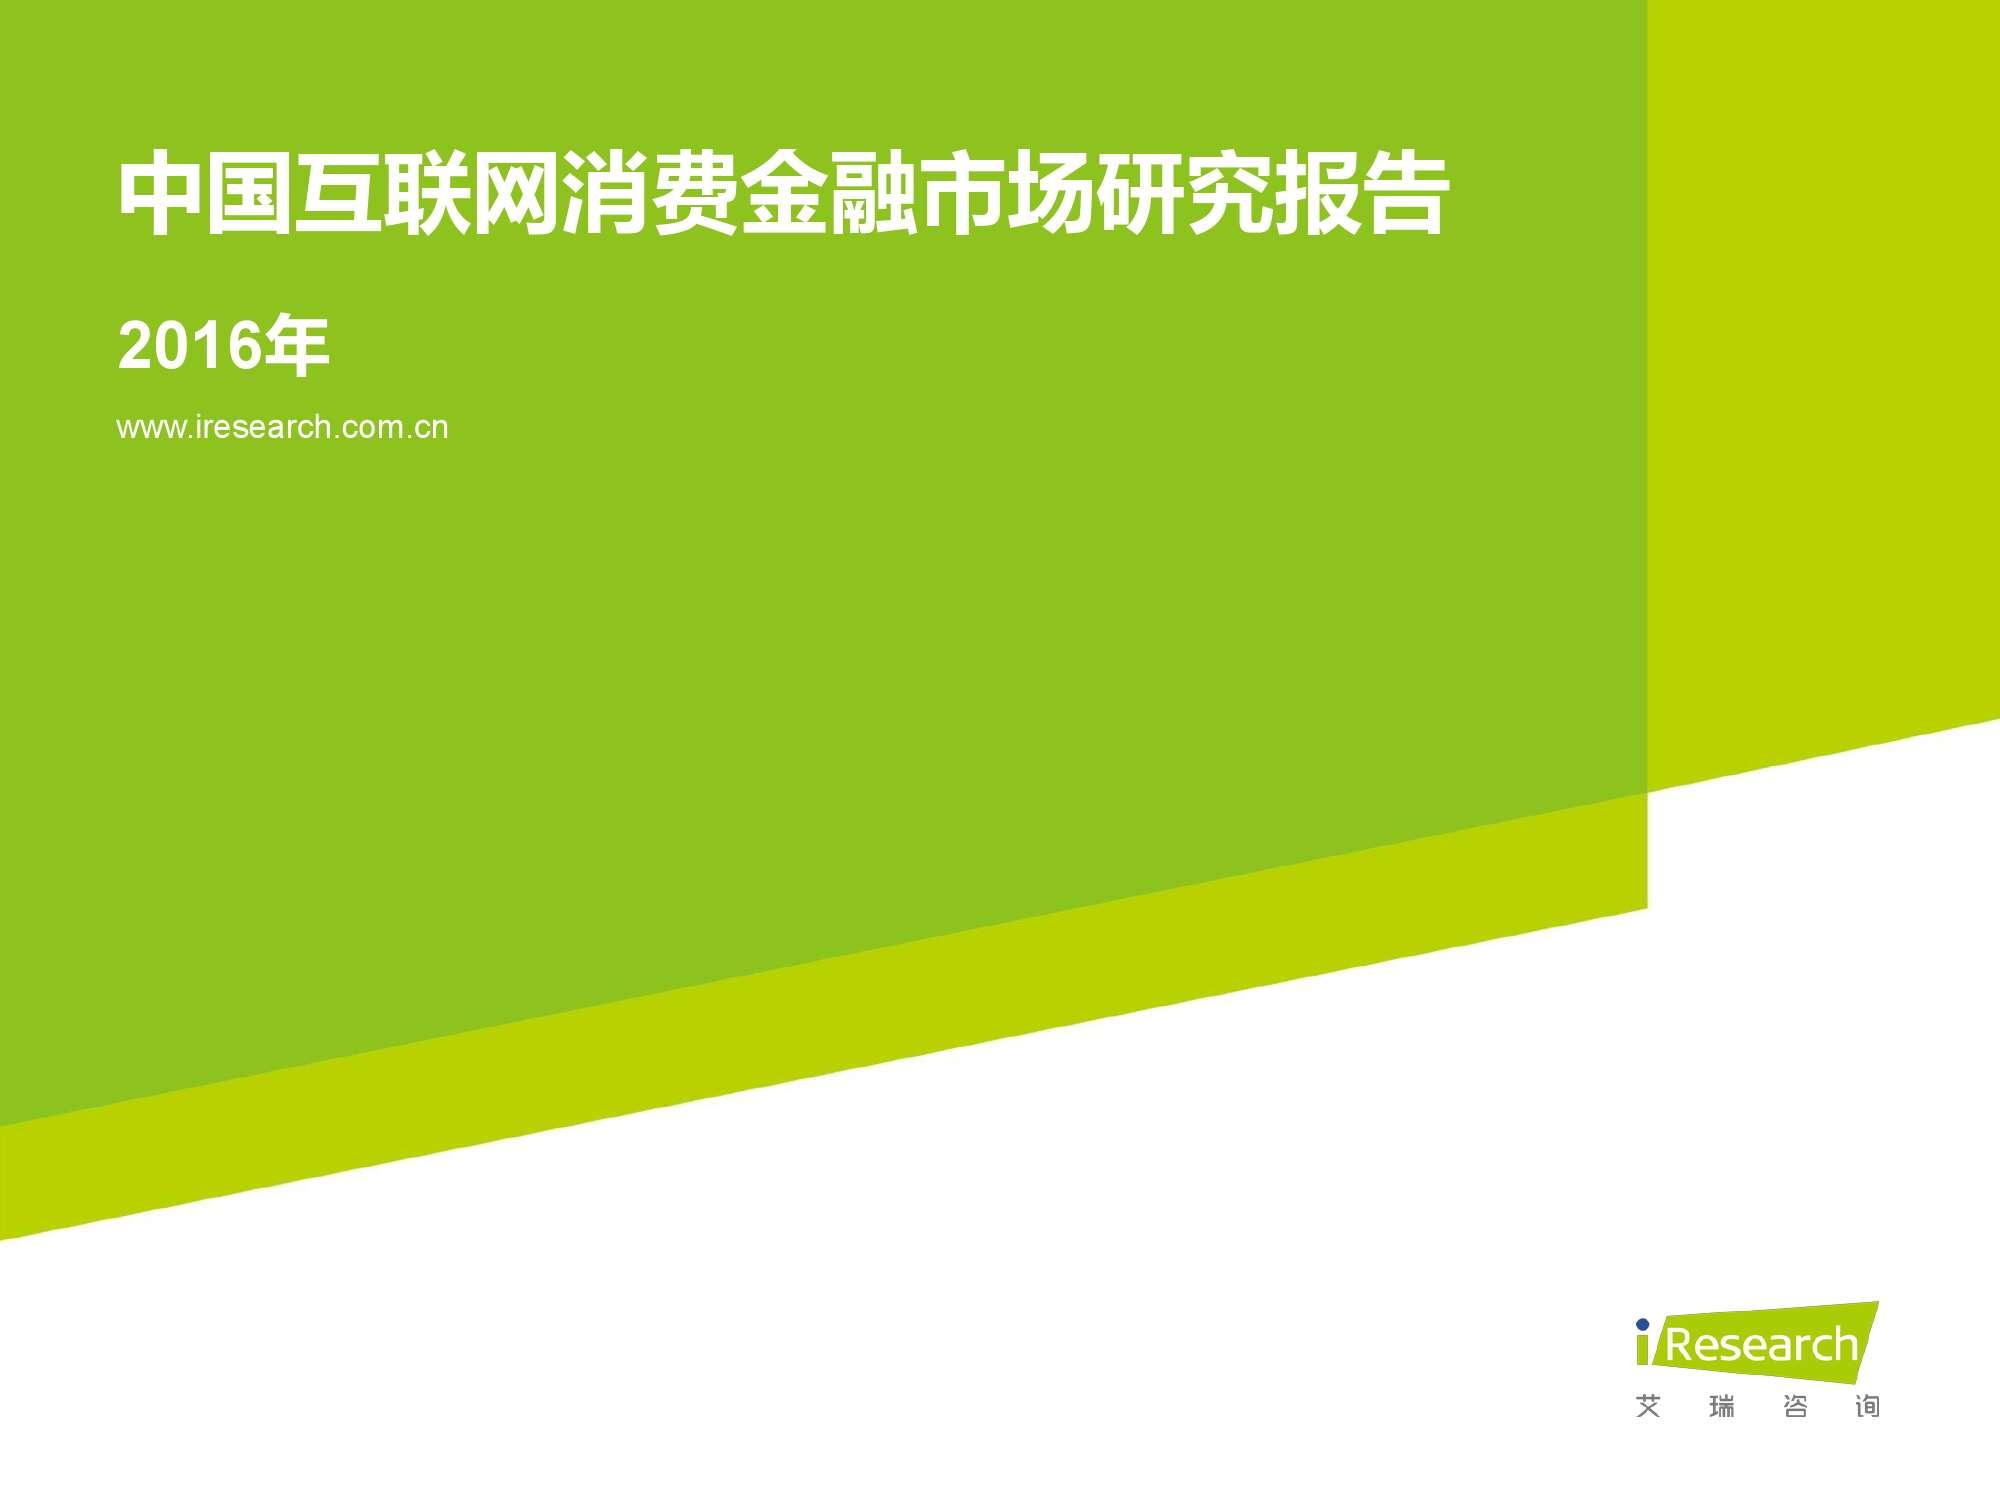 iResearch-2016年中国互联网消费金融市场研究报告_000001